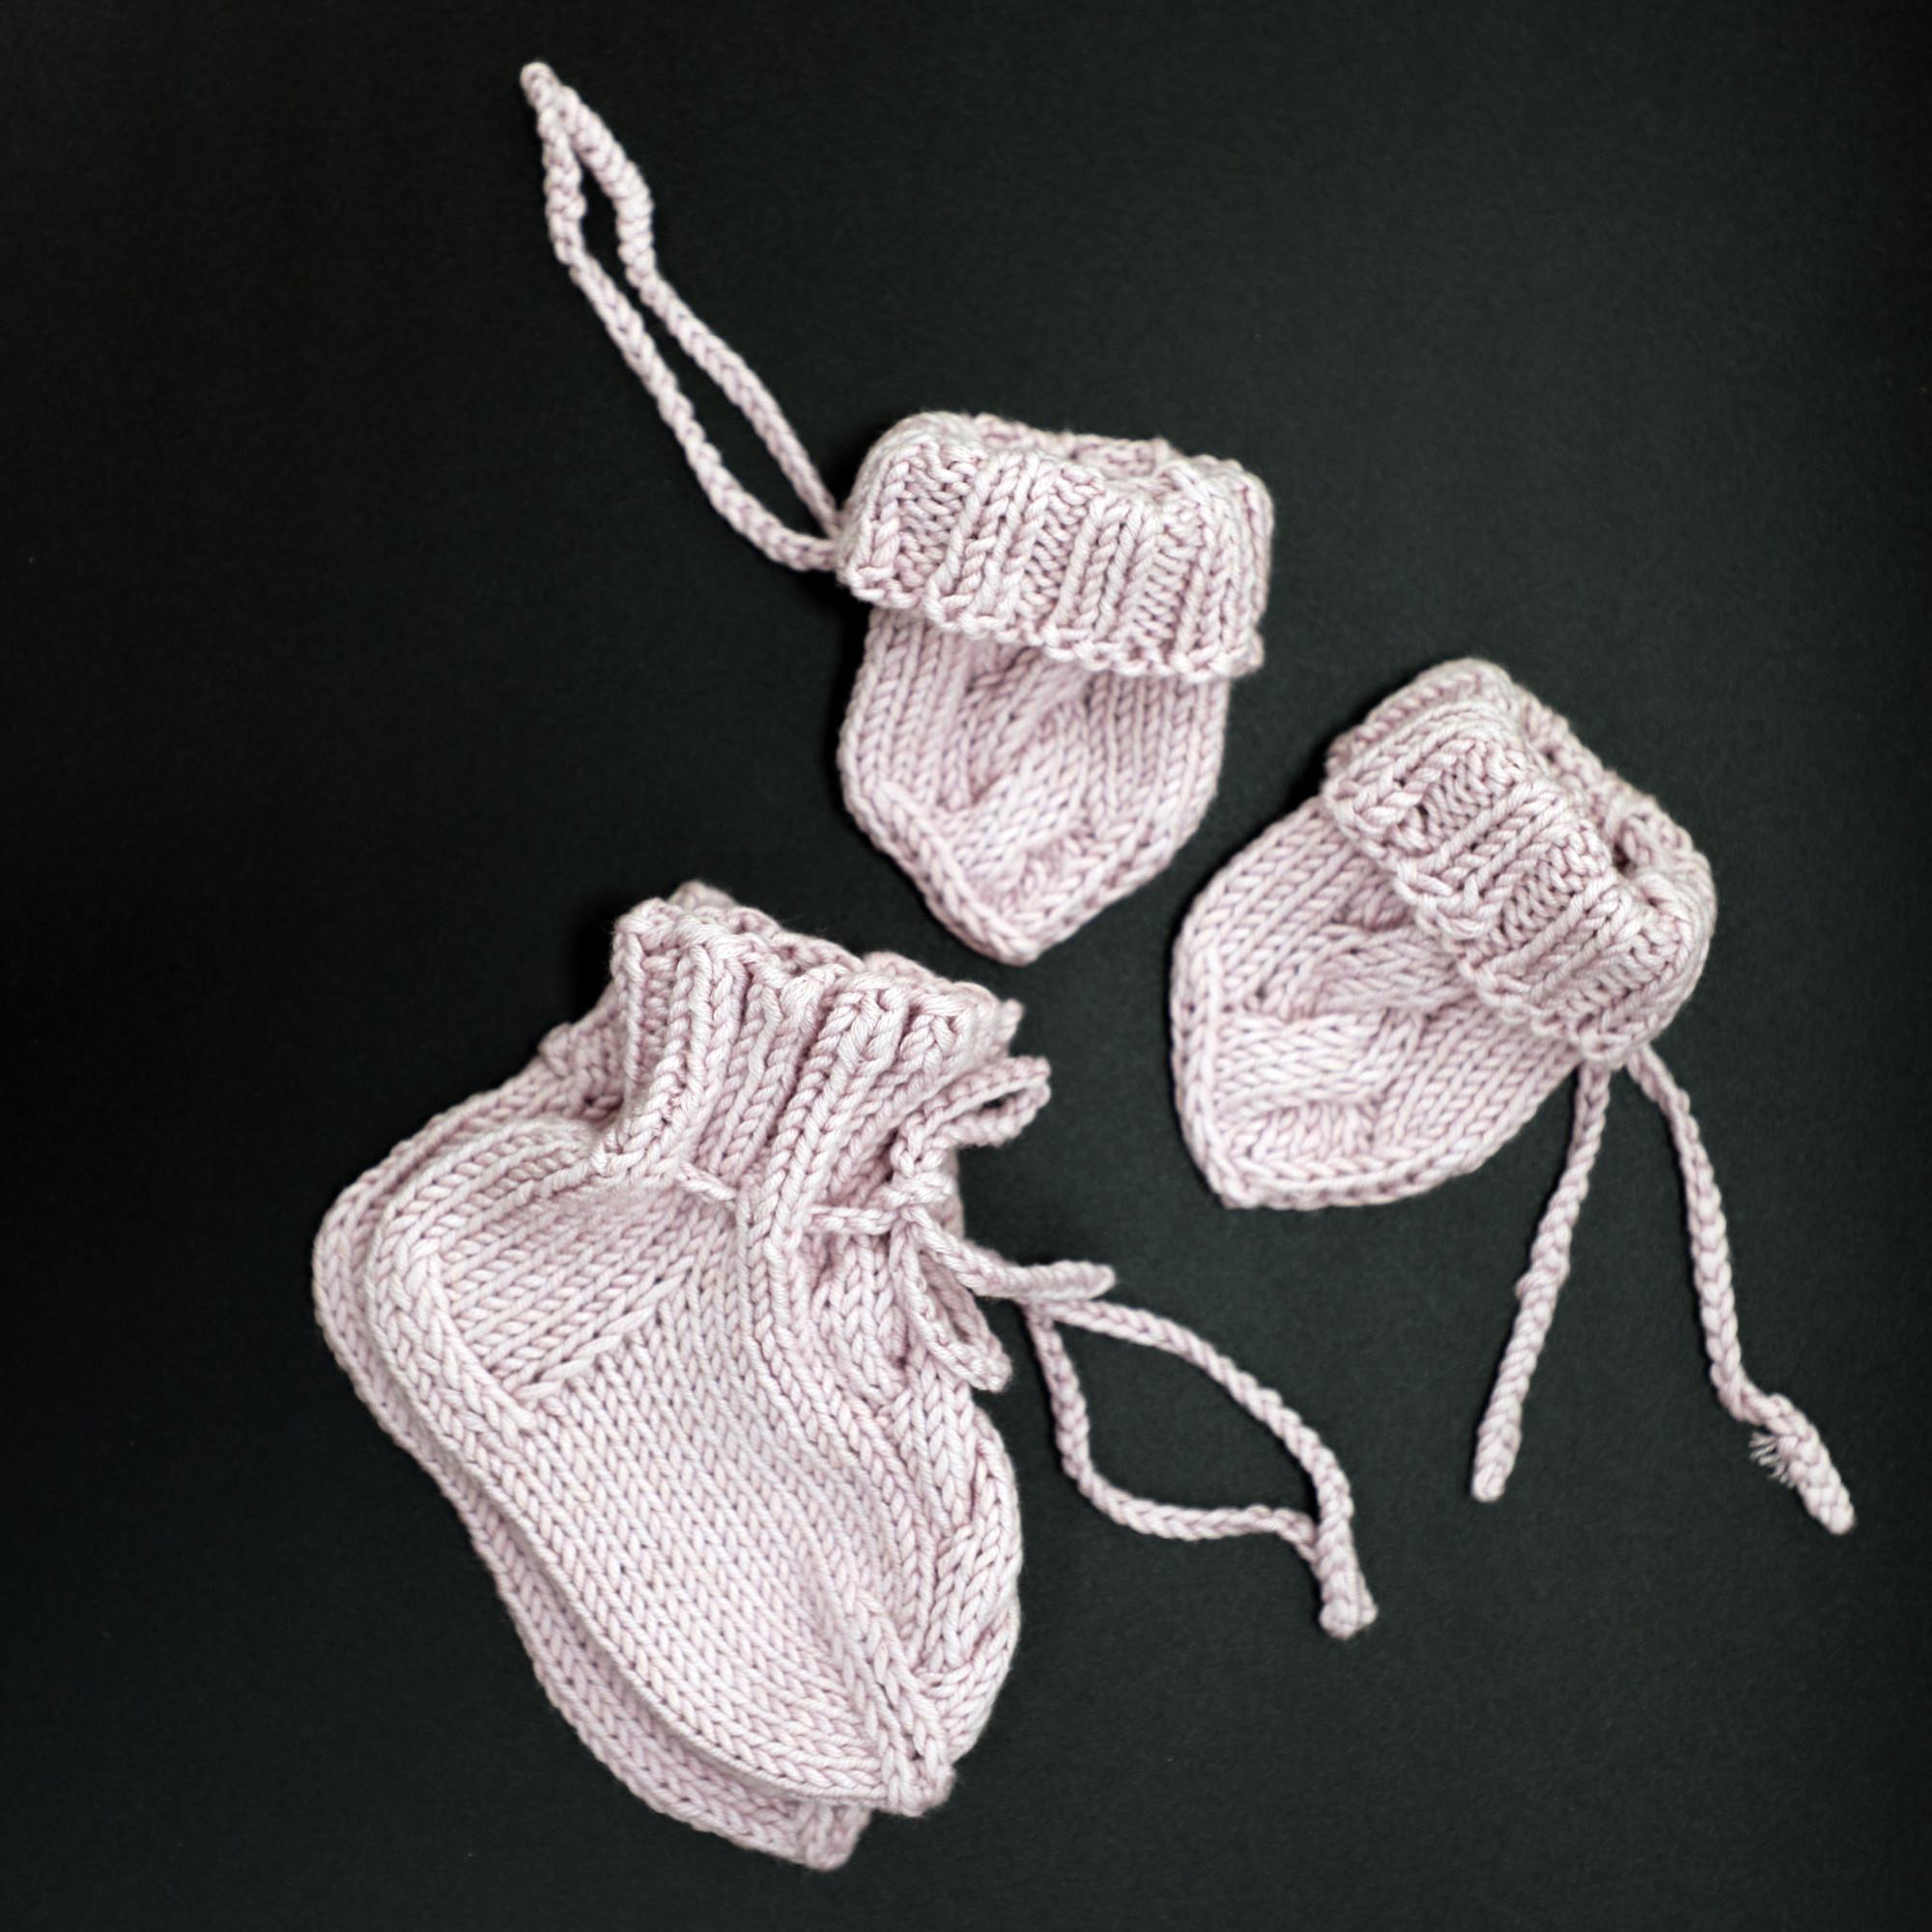 Soft Plum Color Baby Knit Set Scratch Mittens Baby Socks Newborn